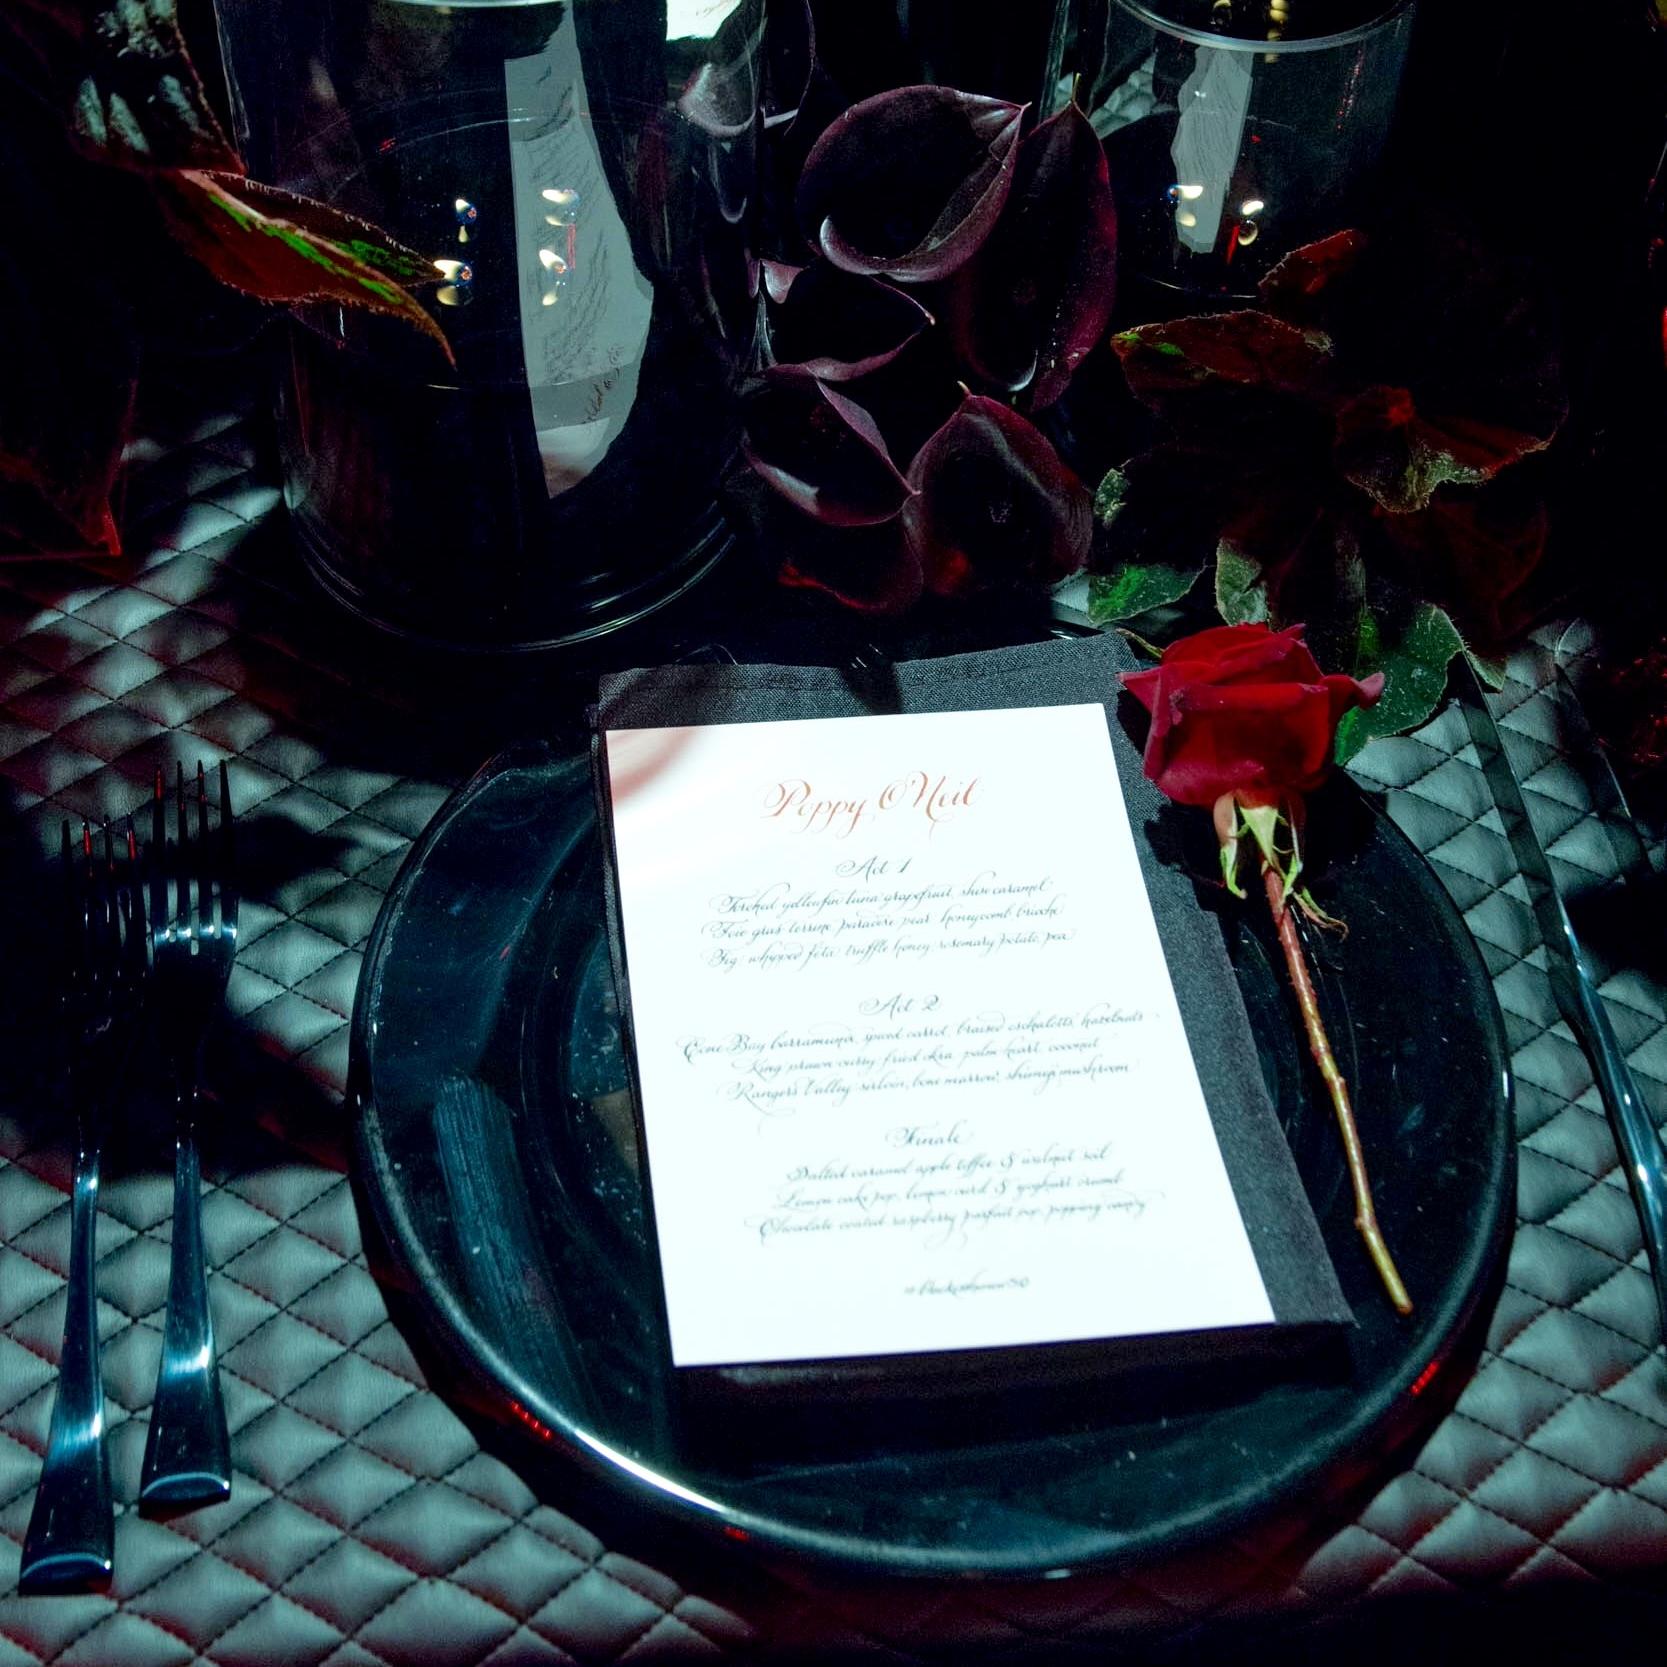 Sydney_wedding_reception_decor_black_glass_charger_plate.jpeg